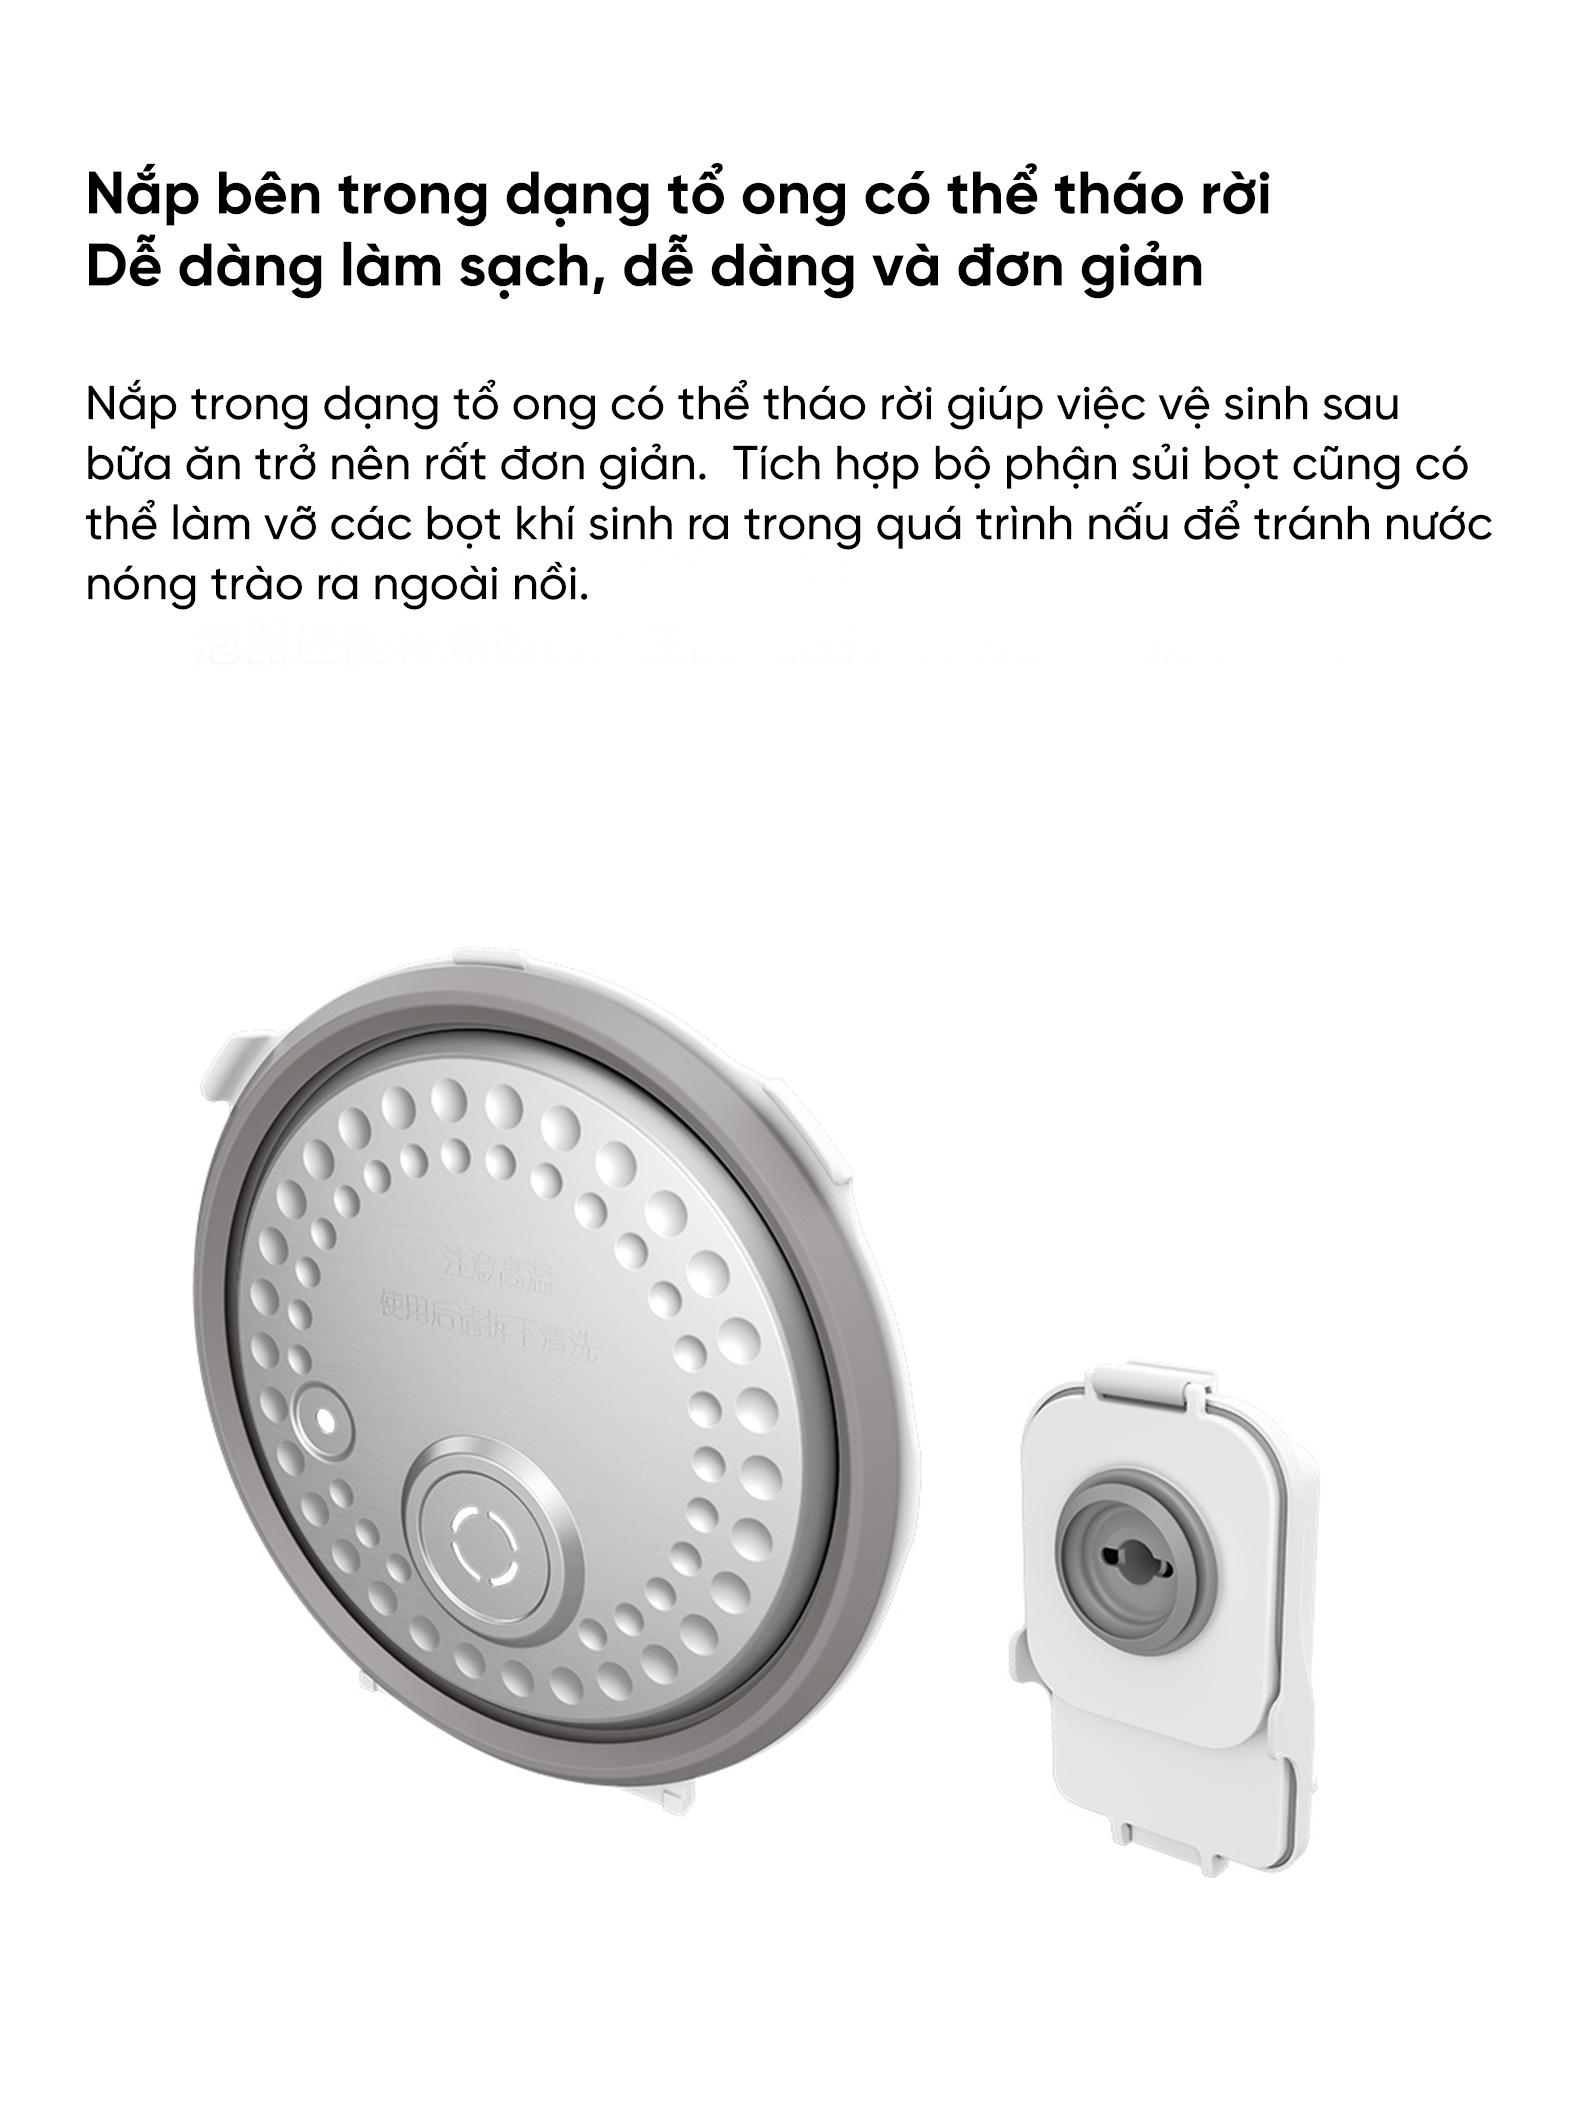 noi-com-dien-cao-tan-thong-minh-xiaomi-4l-IHFB02CM-22